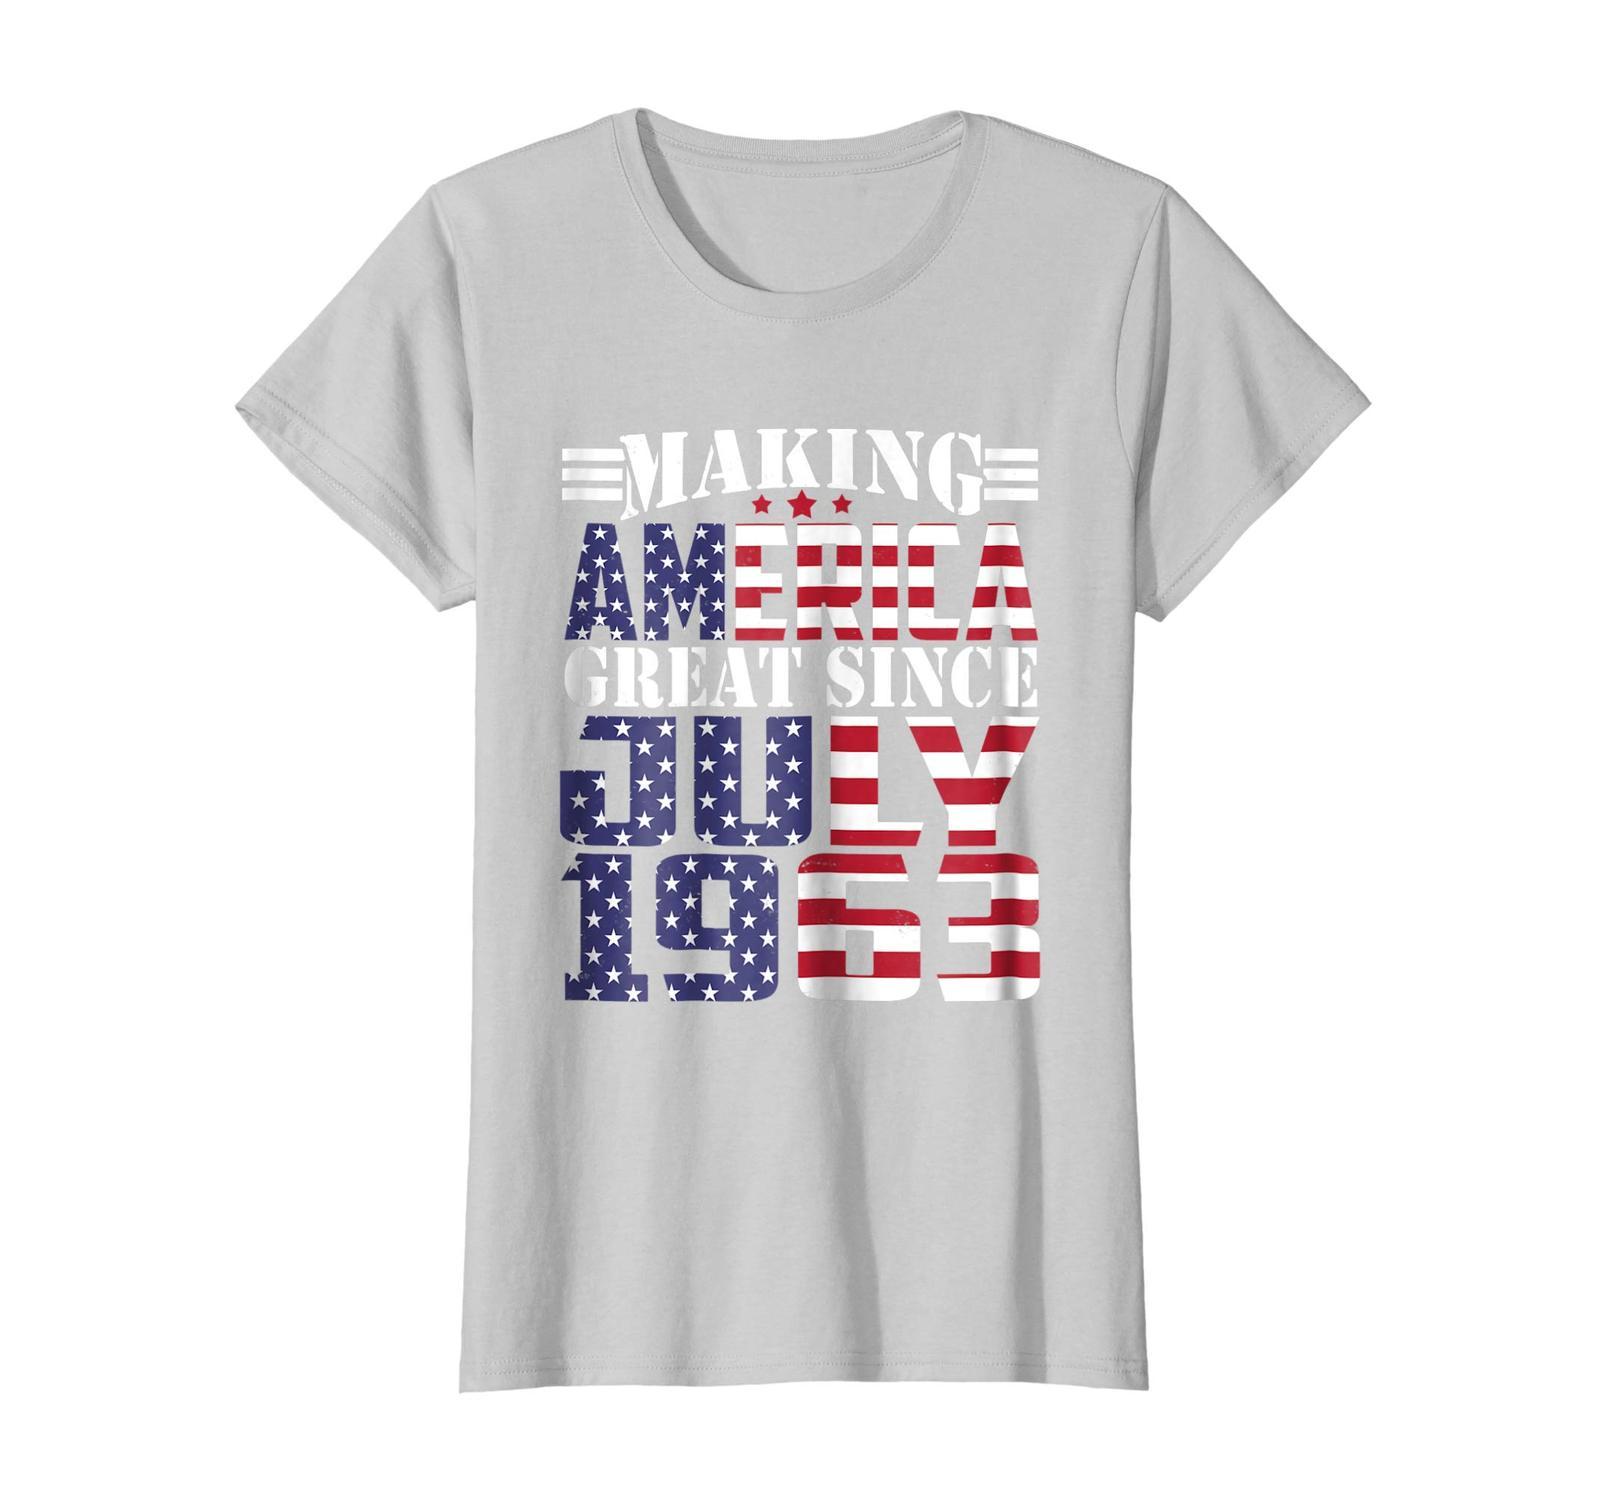 LoveShirt -  Make America Great Since July 1963 55th Birthday Shirt Gifts Wowen